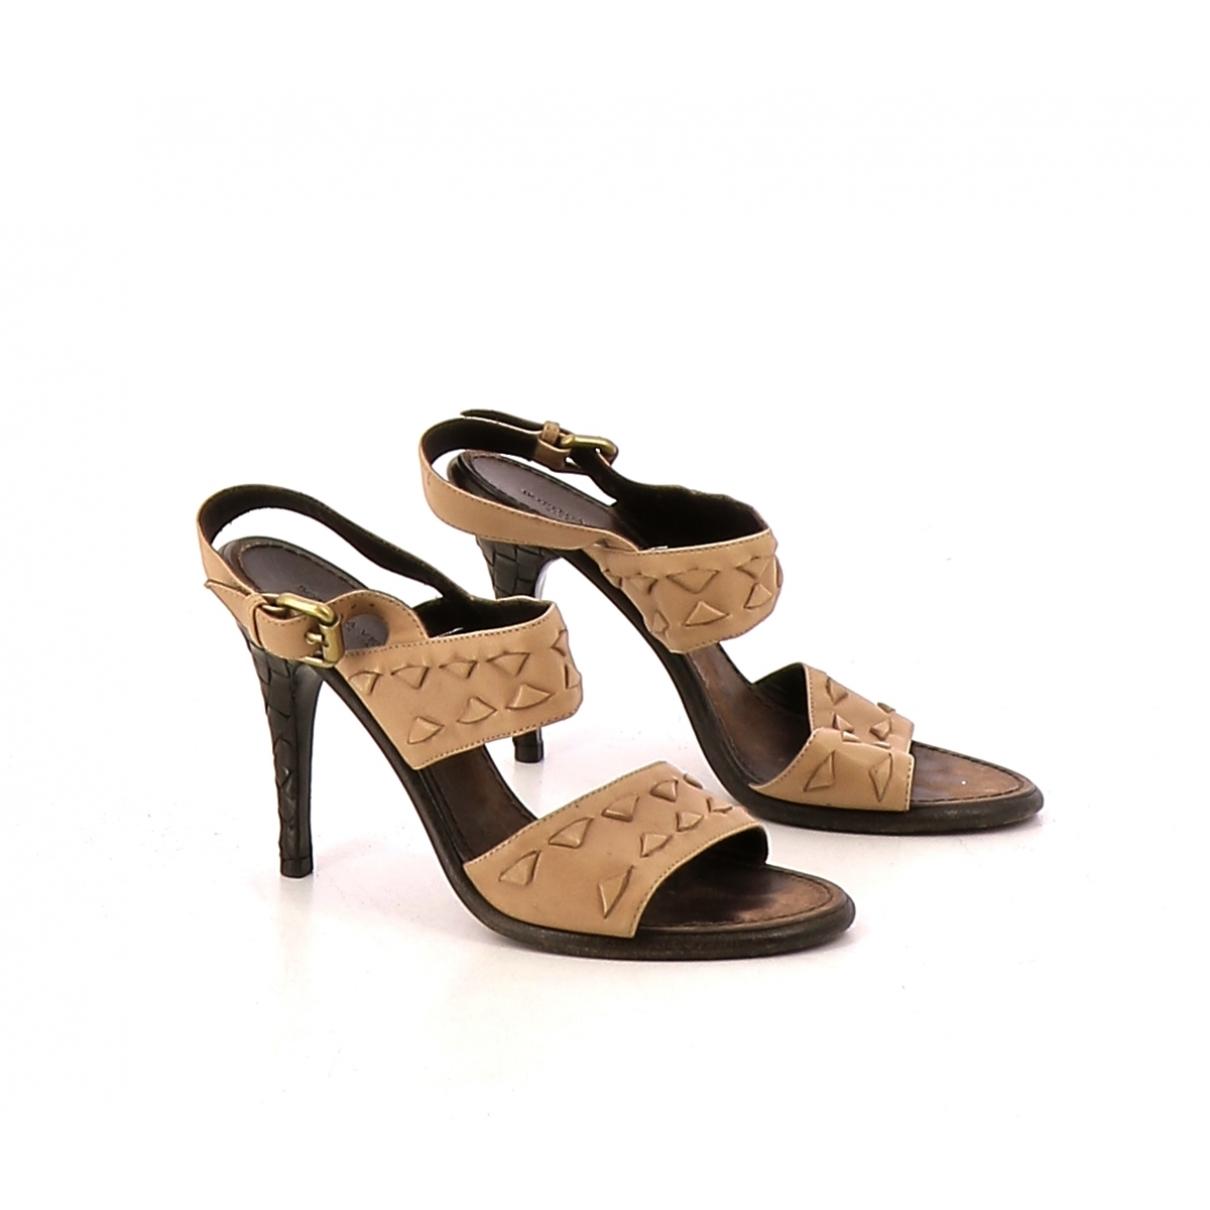 Bottega Veneta - Sandales   pour femme en cuir - beige